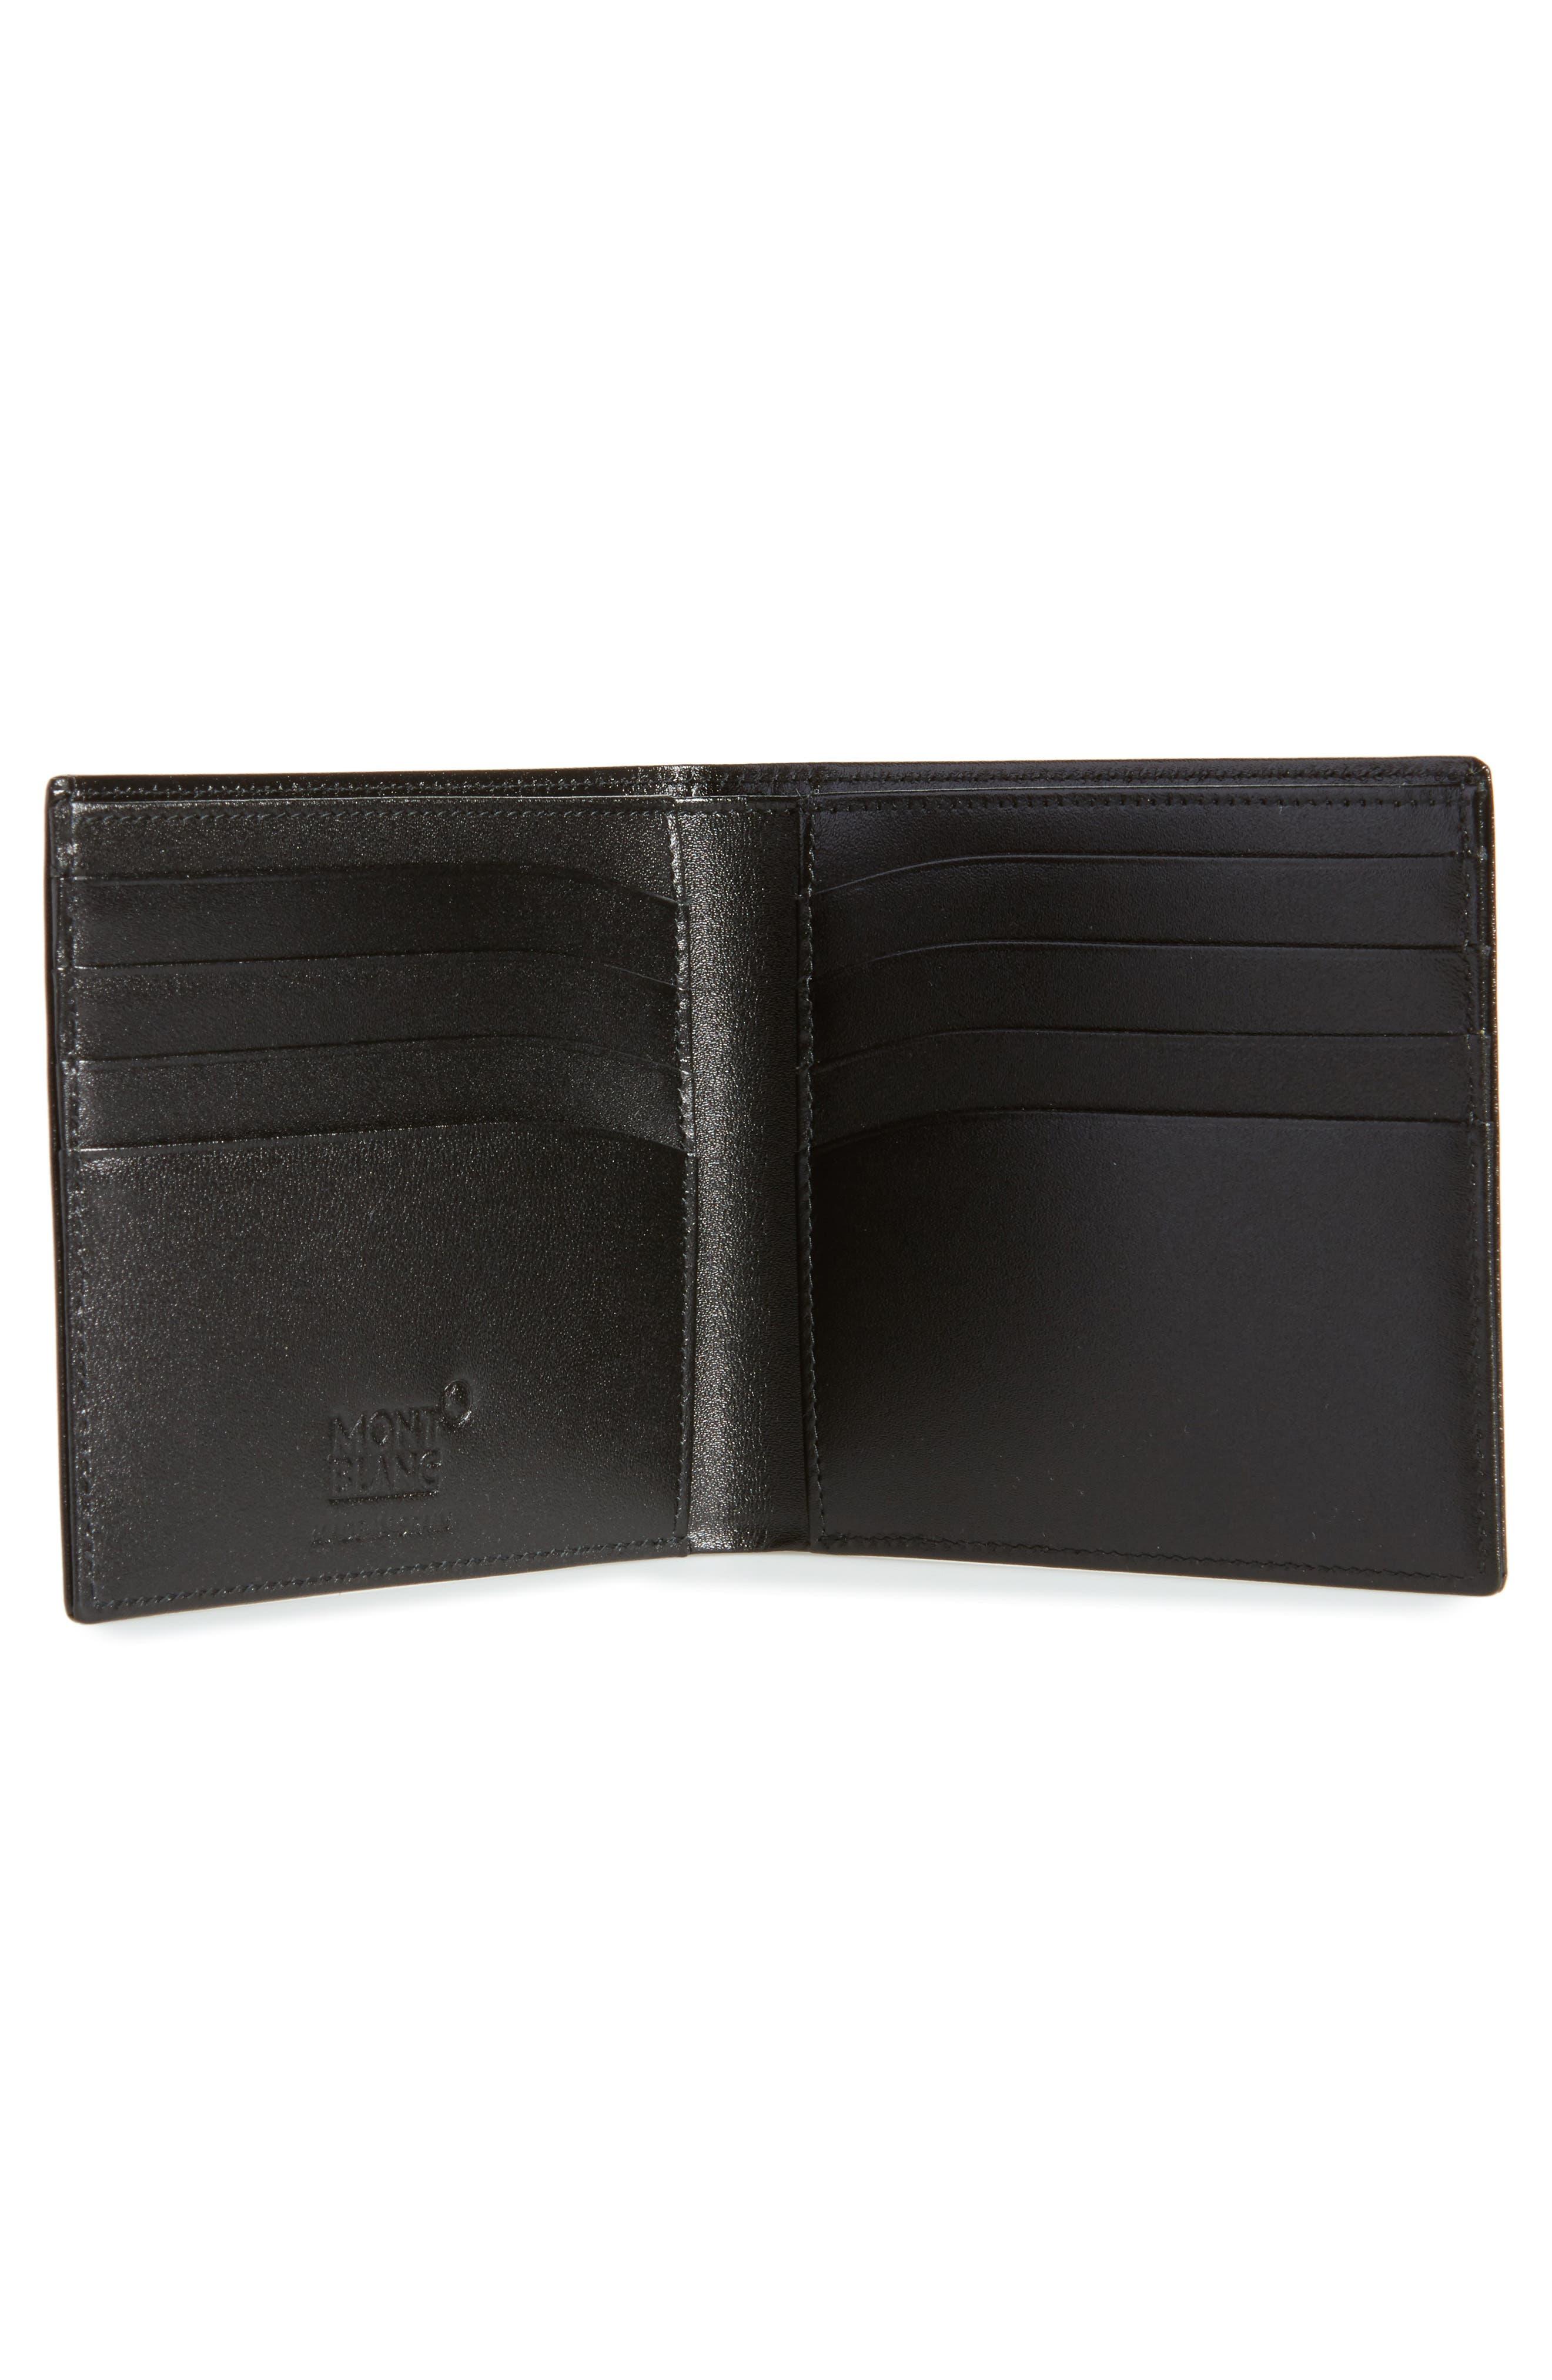 Meisterstück Leather Wallet,                             Alternate thumbnail 2, color,                             BLACK